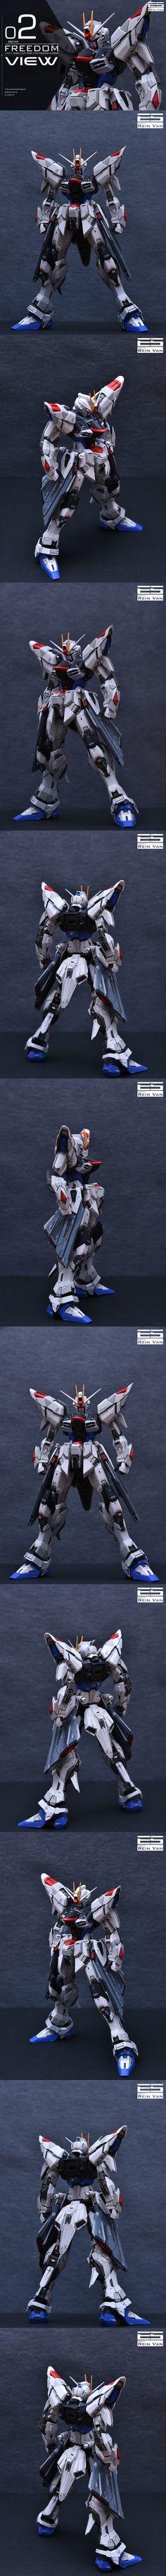 [Infinite_Dimension] 1:100 프리덤 2.0 컨버전킷(레진), 공식 도색 작례 공개! : 네이버 블로그 Gundam Toys, Gundam Art, Gundam Tutorial, Mythological Monsters, Frame Arms, Gundam Model, Mobile Suit, Scale Model, Captain America